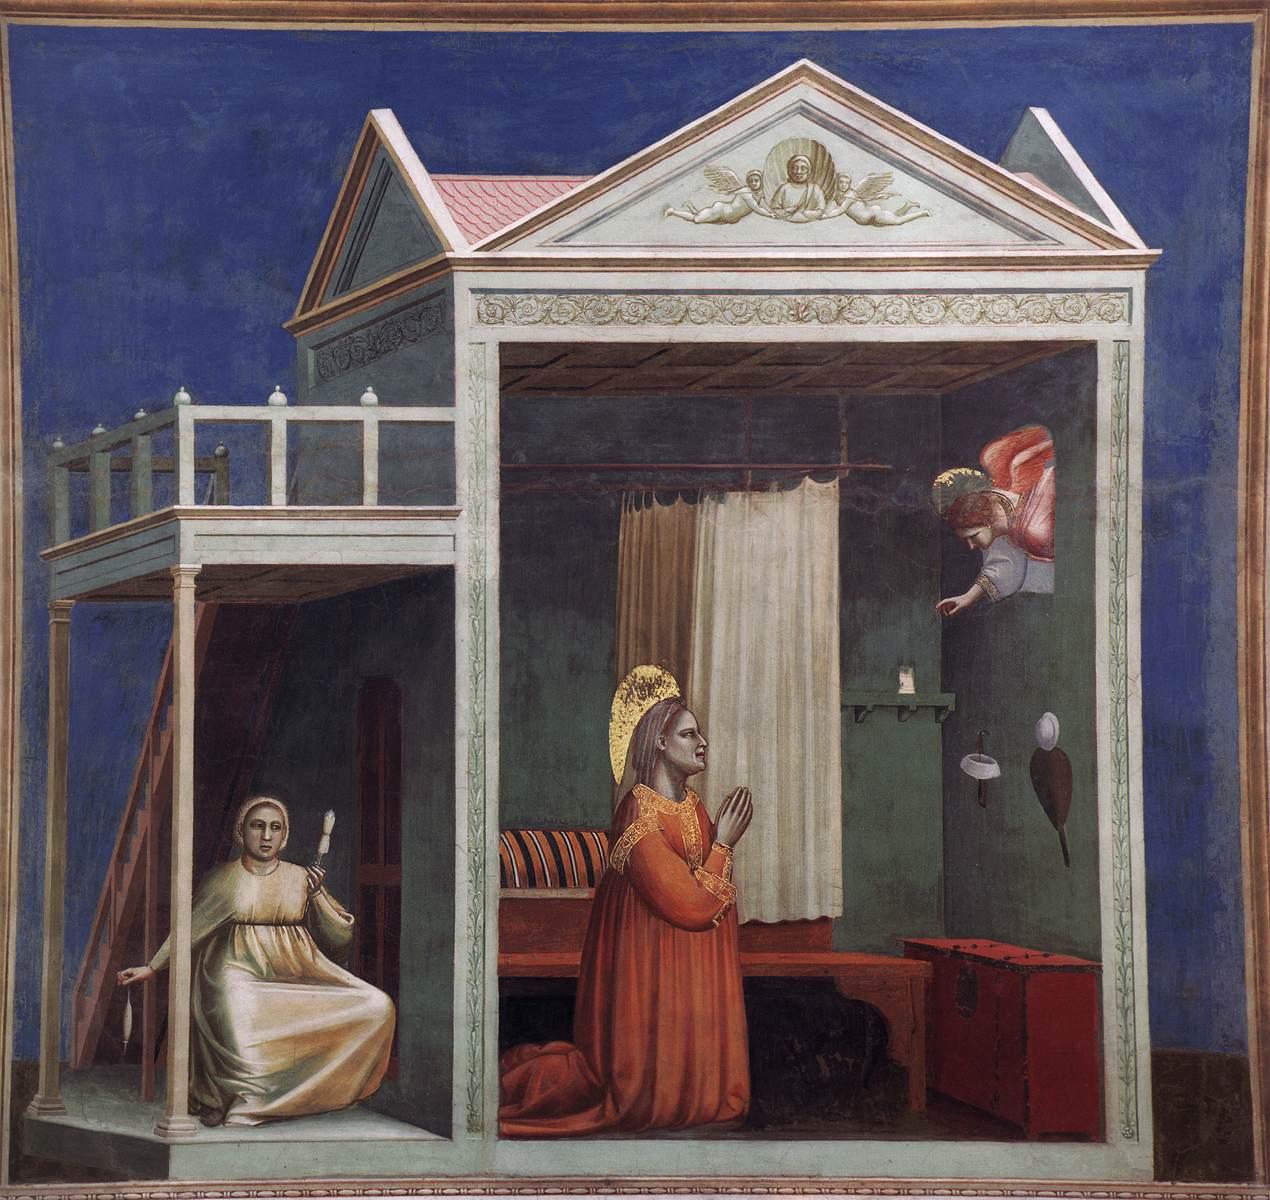 Giotto, Annunciation to Saint Anne, 1304-06